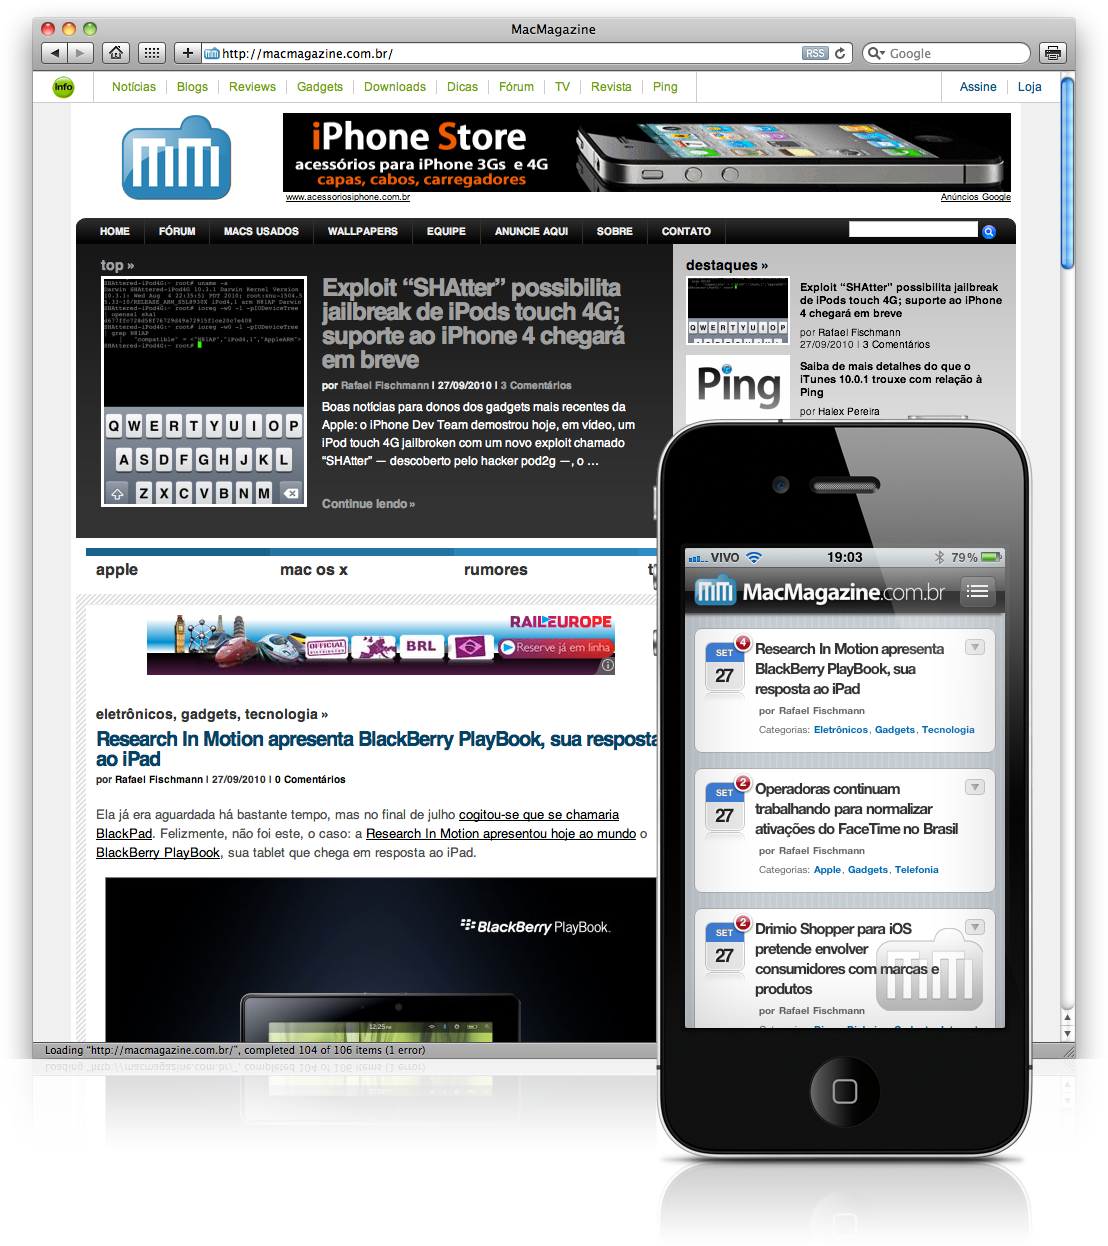 MacMagazine no WPtouch Pro